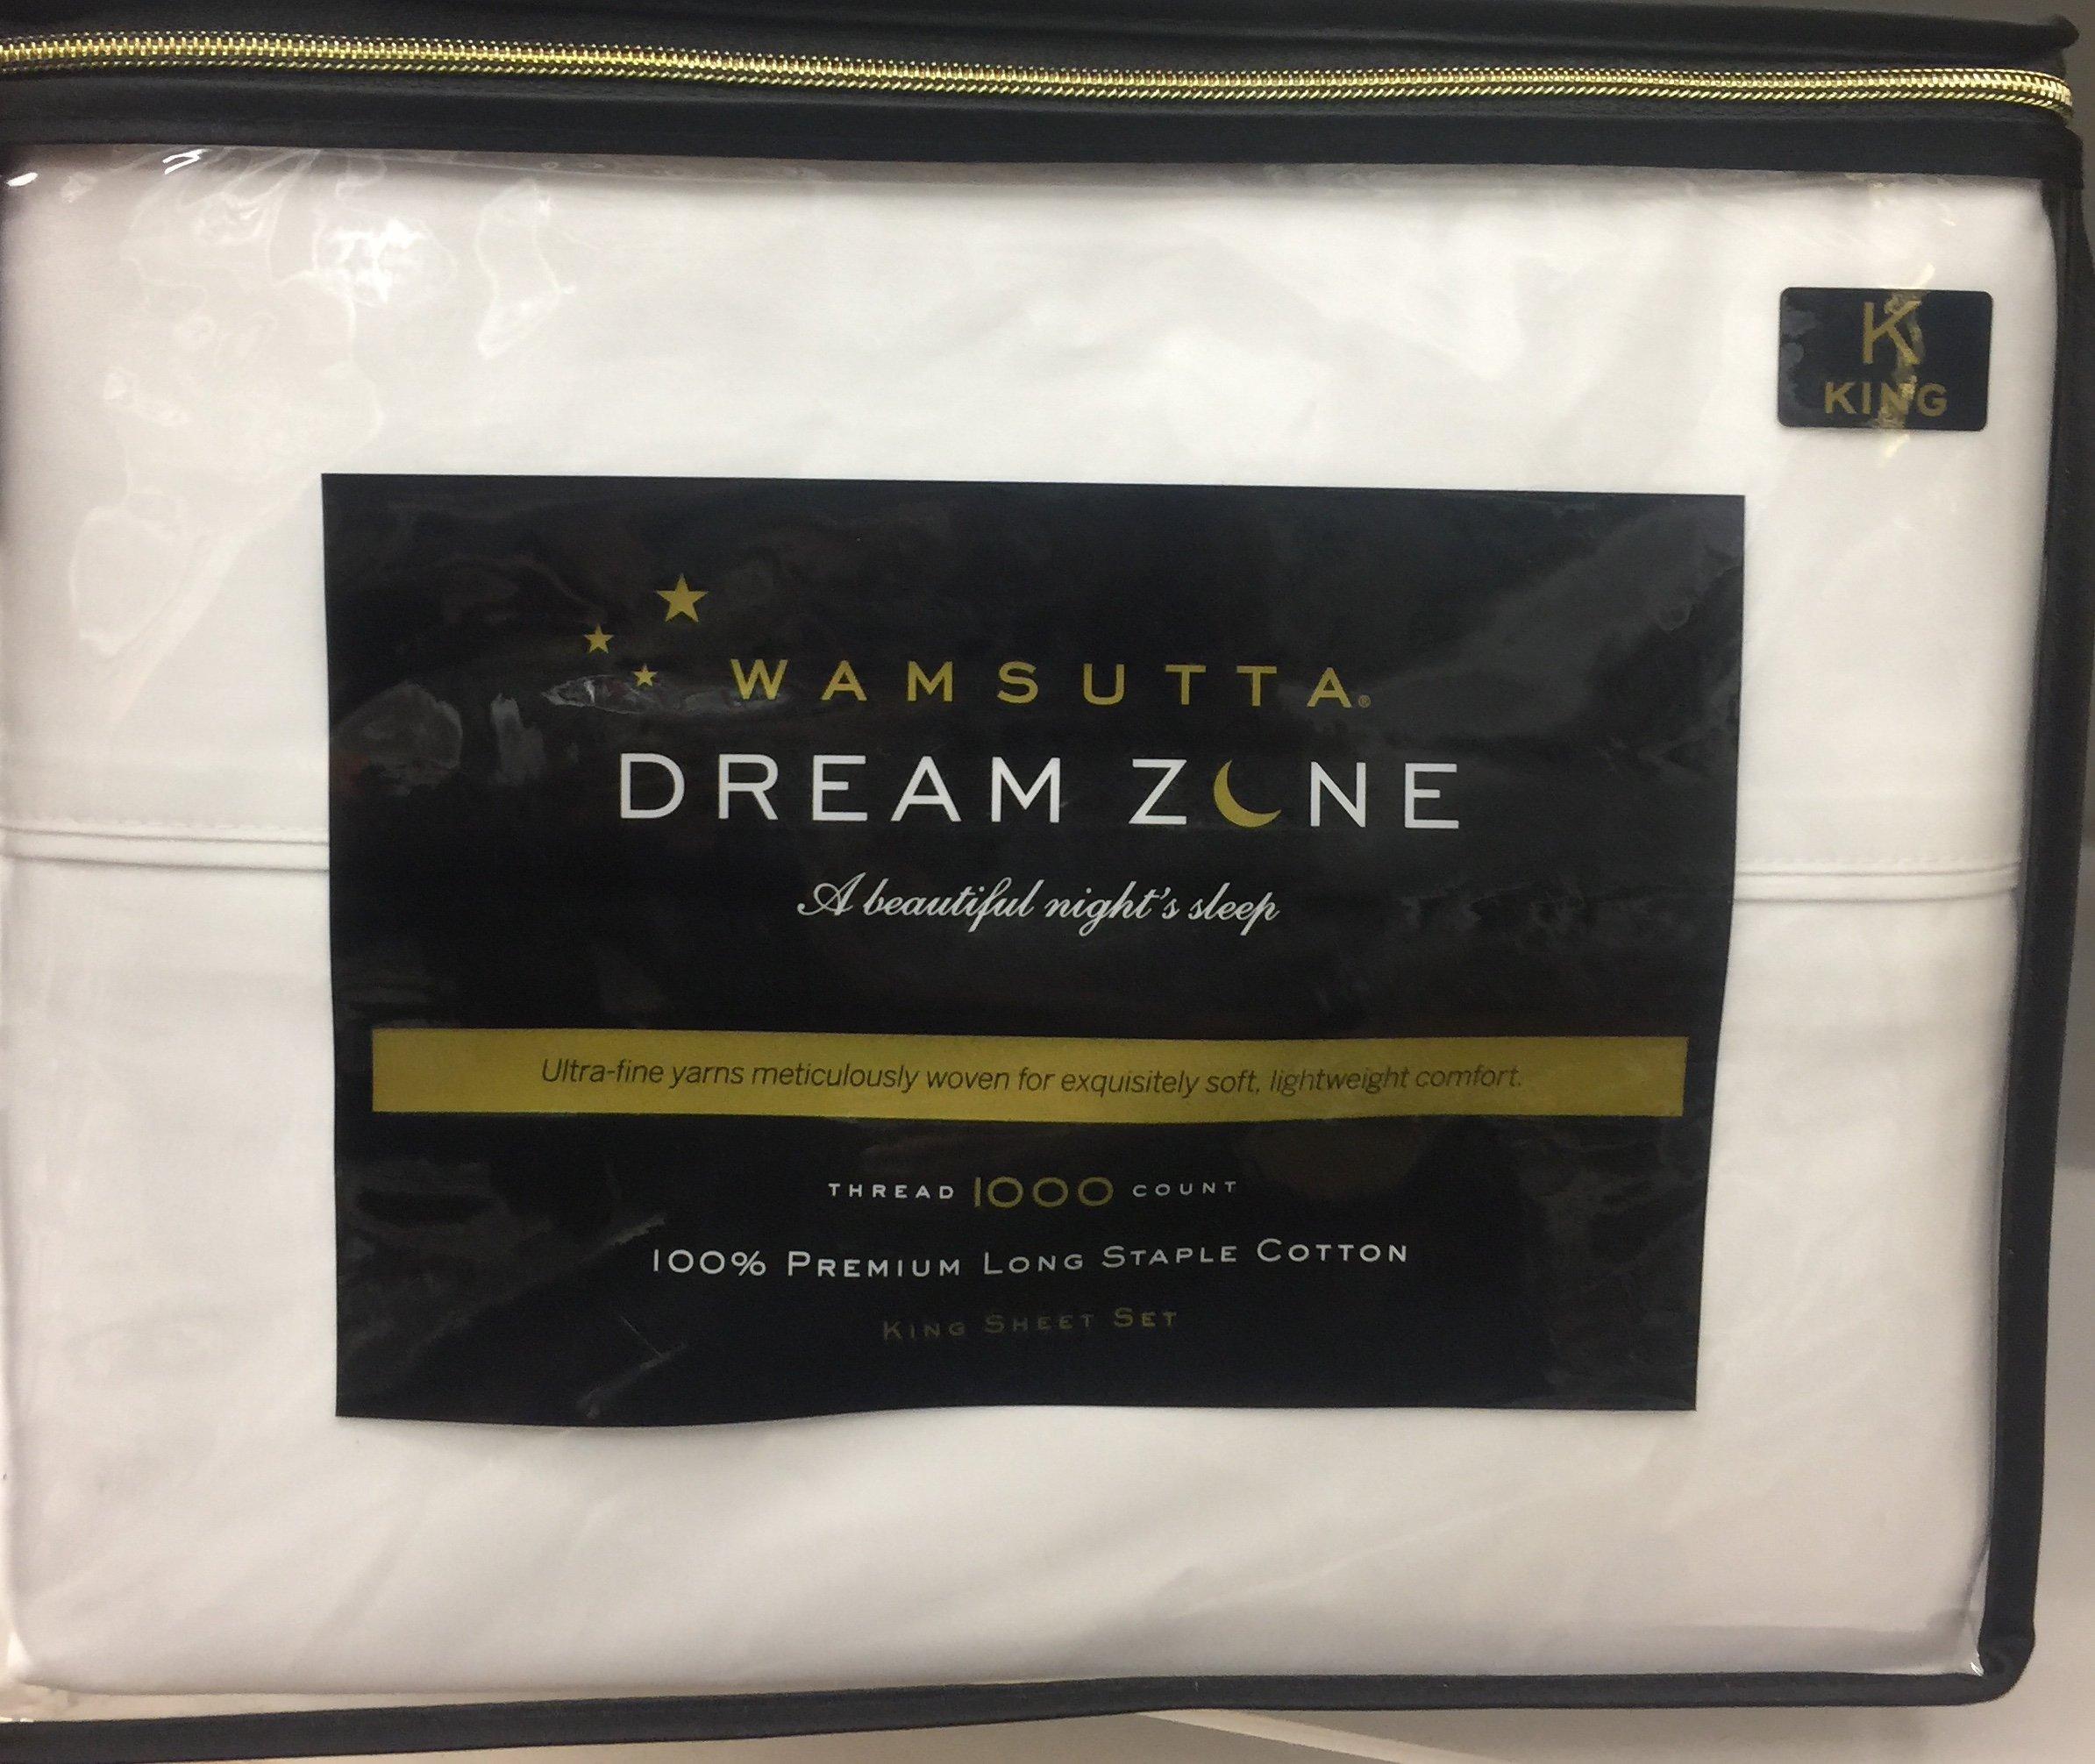 Wamsutta Dream Zone Deep Pocket White King Sheet Set, 1000 Thread Count